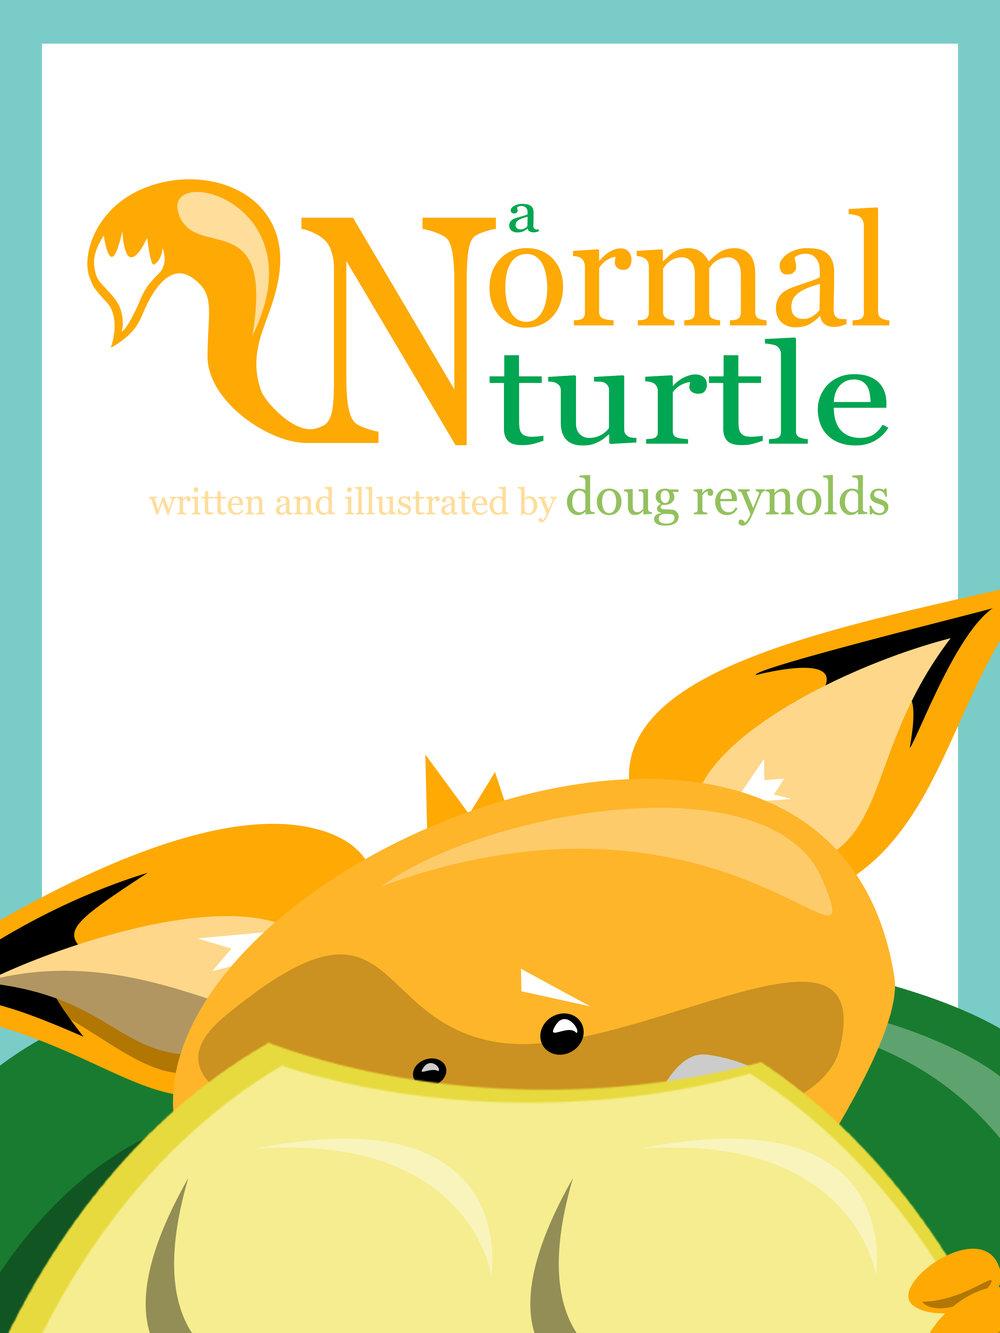 A Normal Turtle.jpg